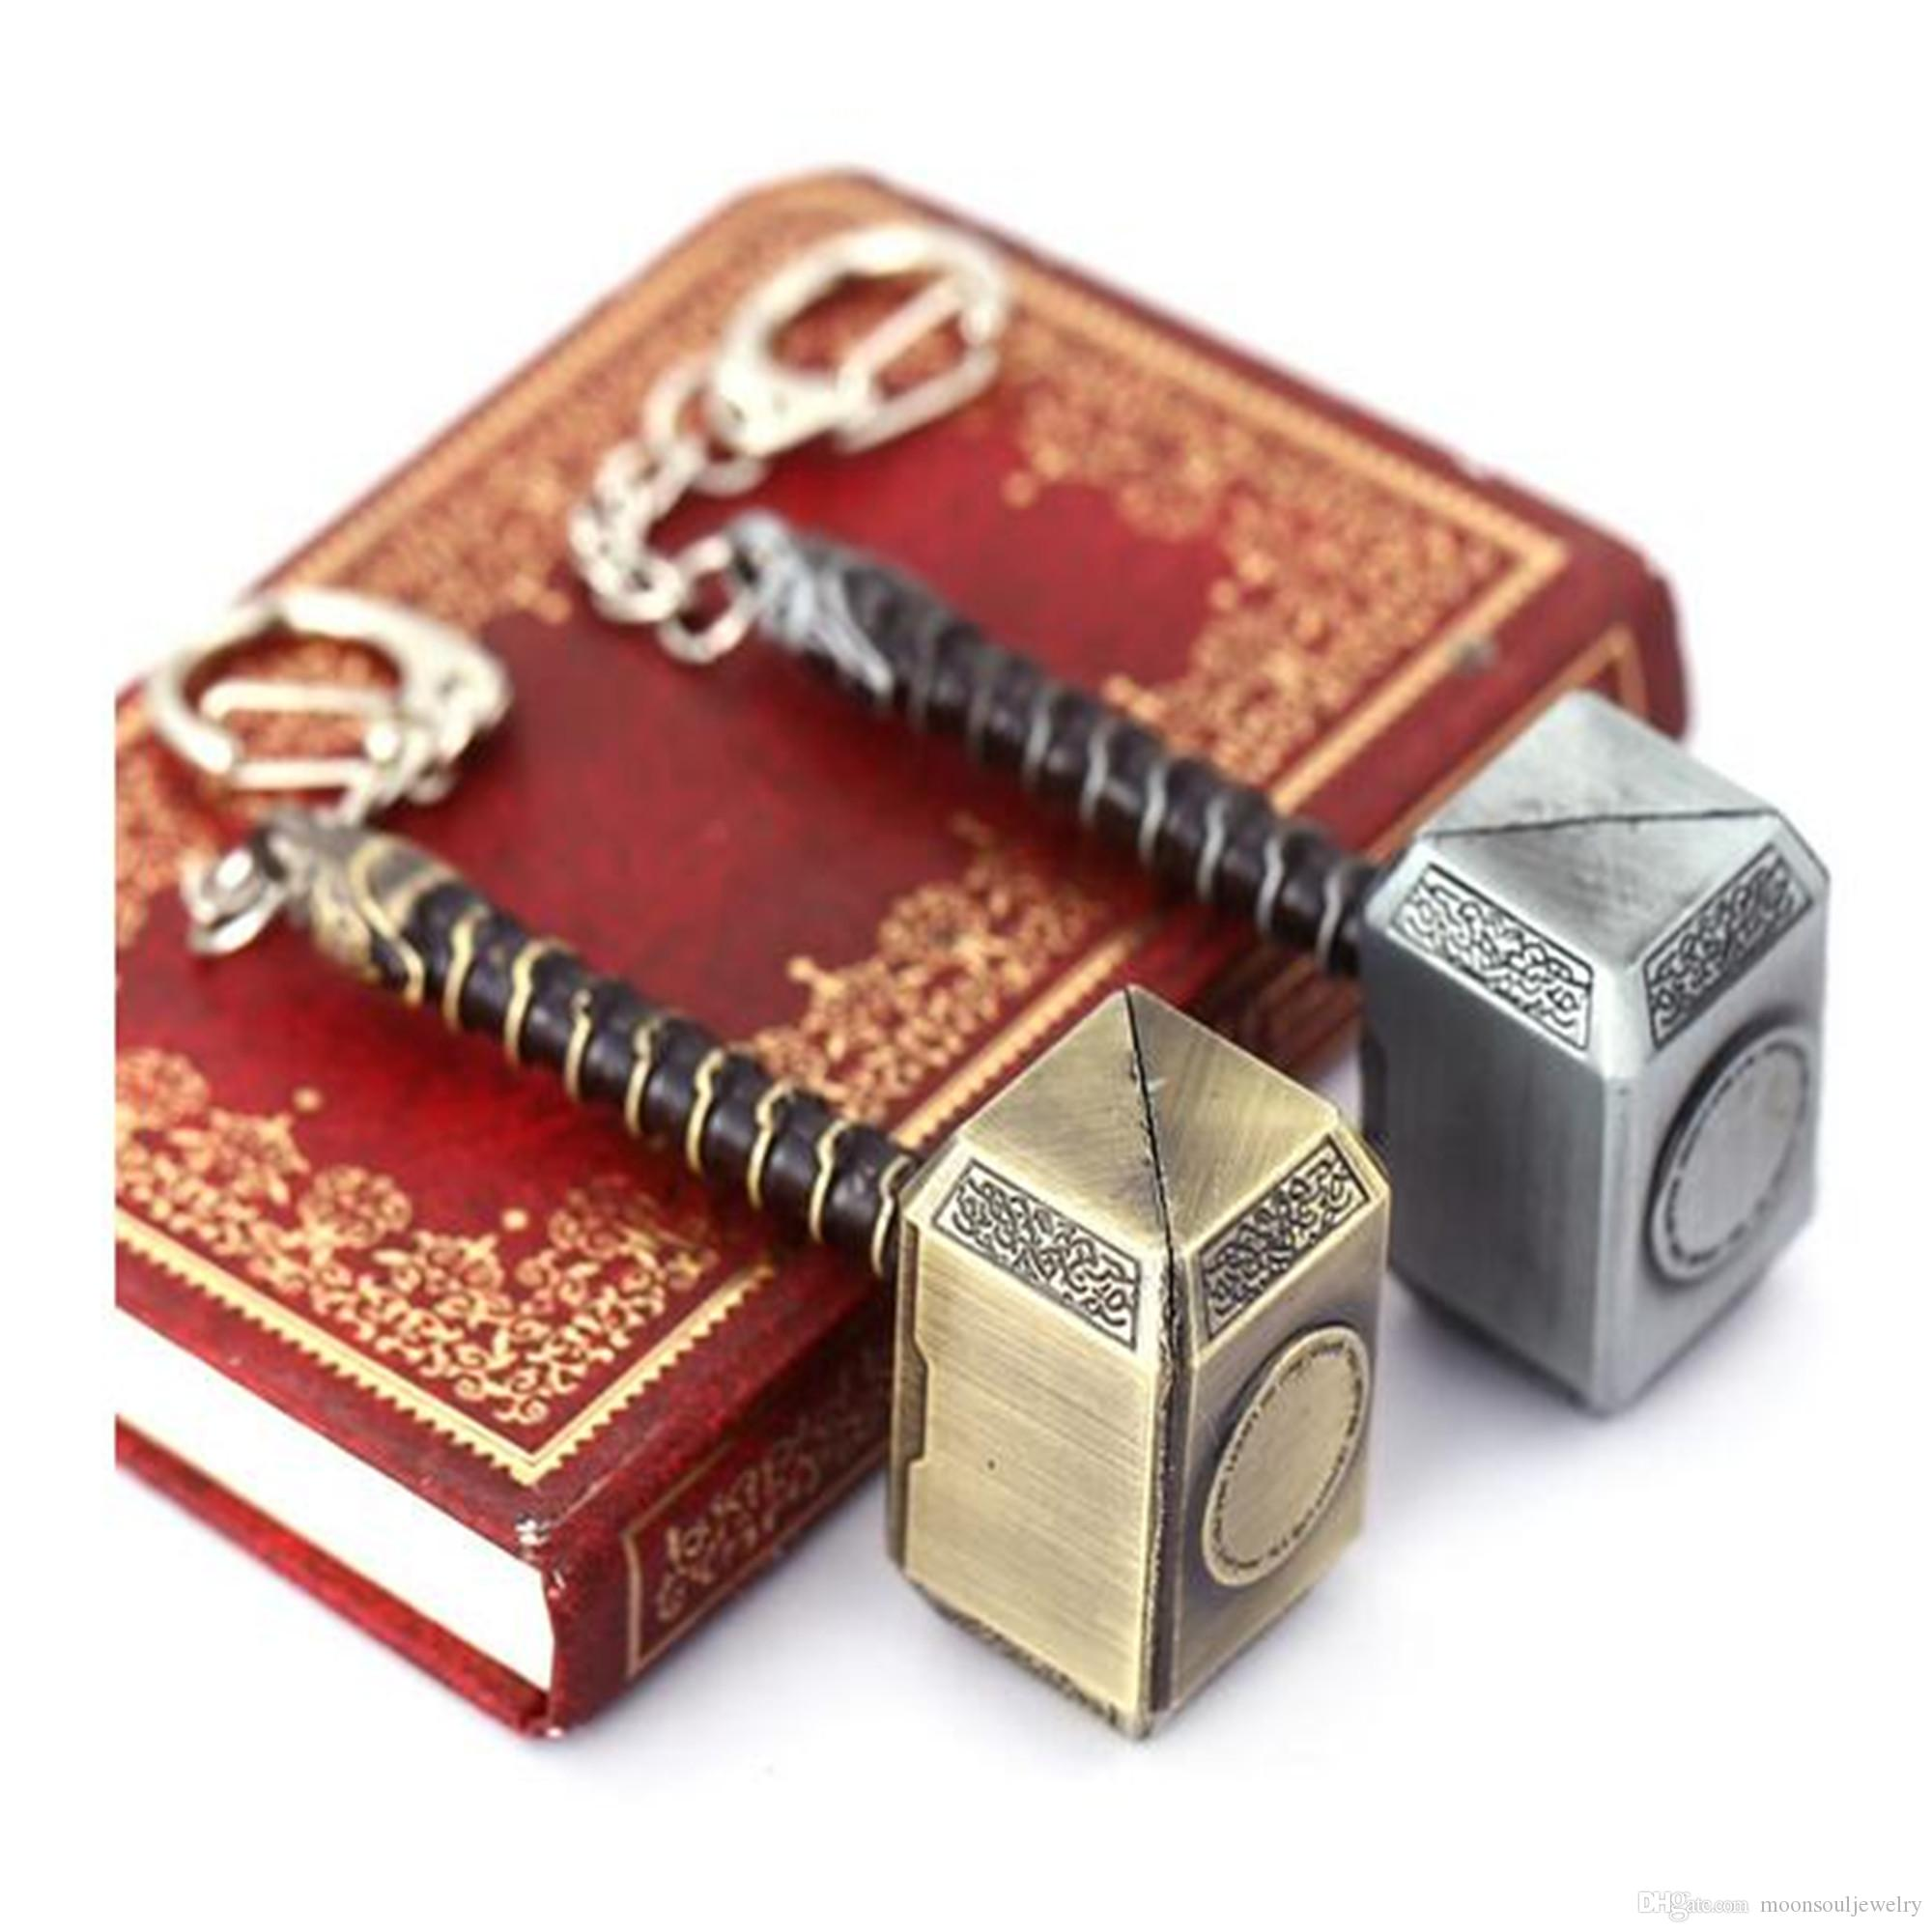 HSIC Thor Mjolnir Hammer Metal Keychain Mjolnir Figure Key Ring Gold Silver Pendant Men Llavero Jewelry Wholesale